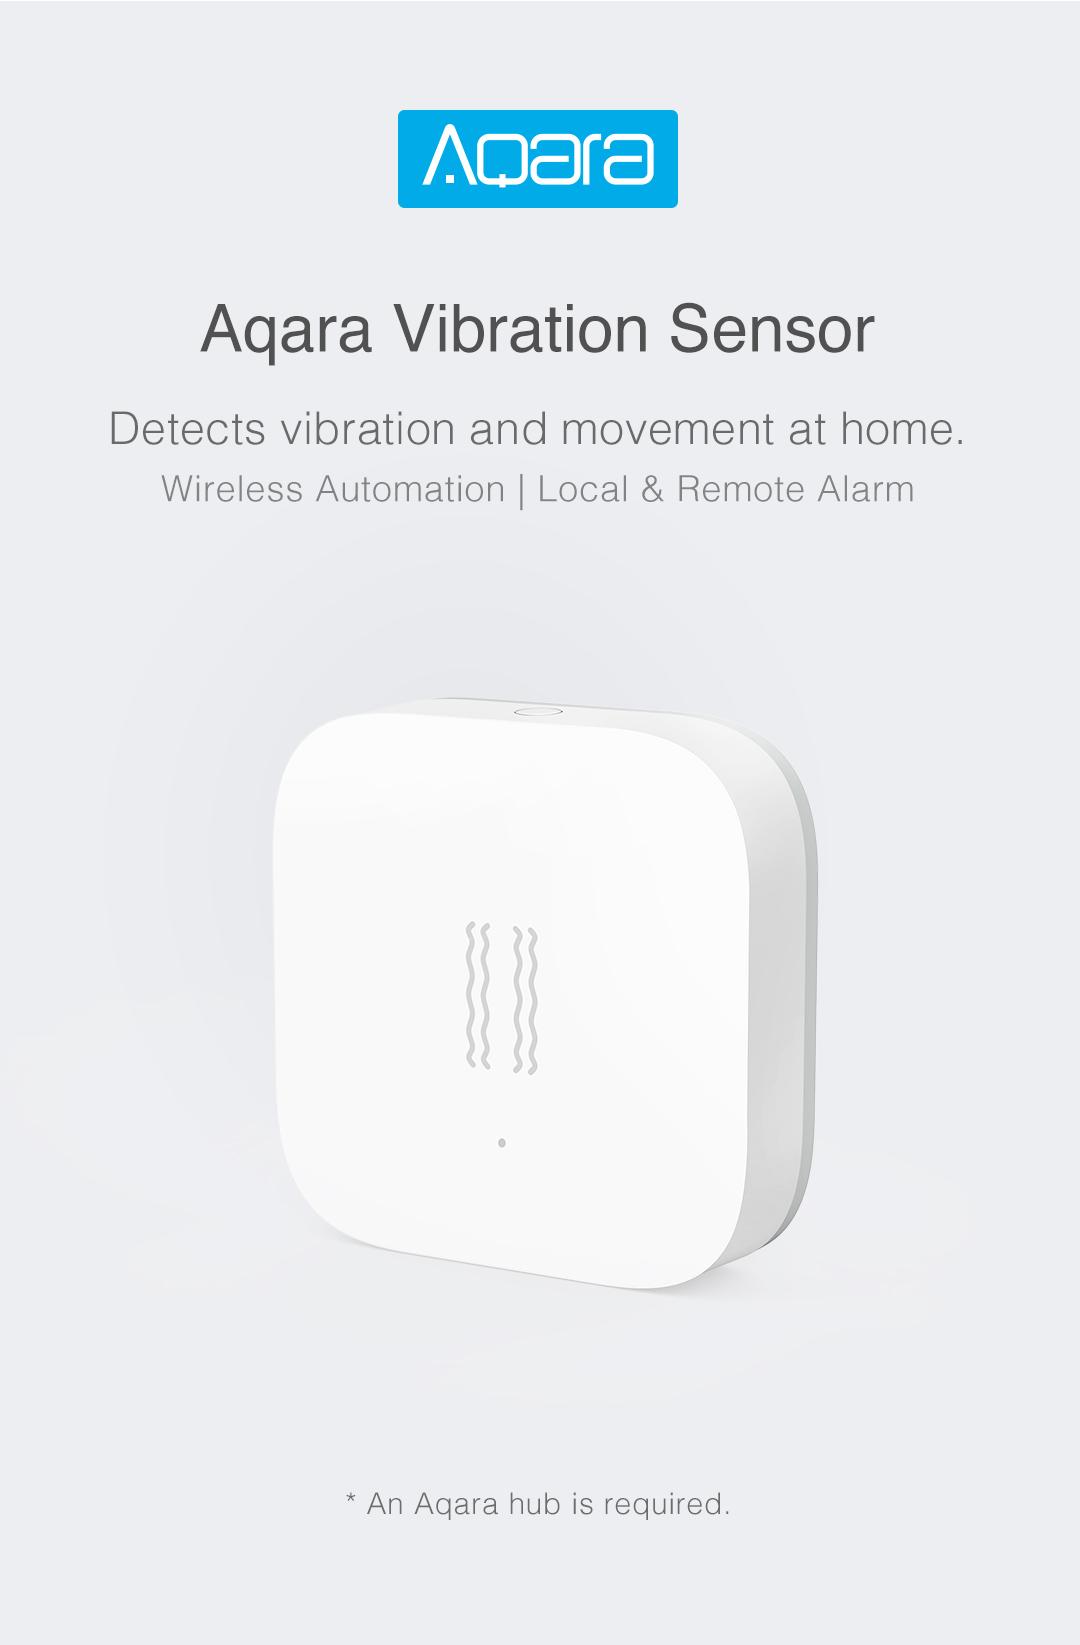 Aqara vibration sensor detects vibration at home. Wireless Automation   Local & Remote Alarm